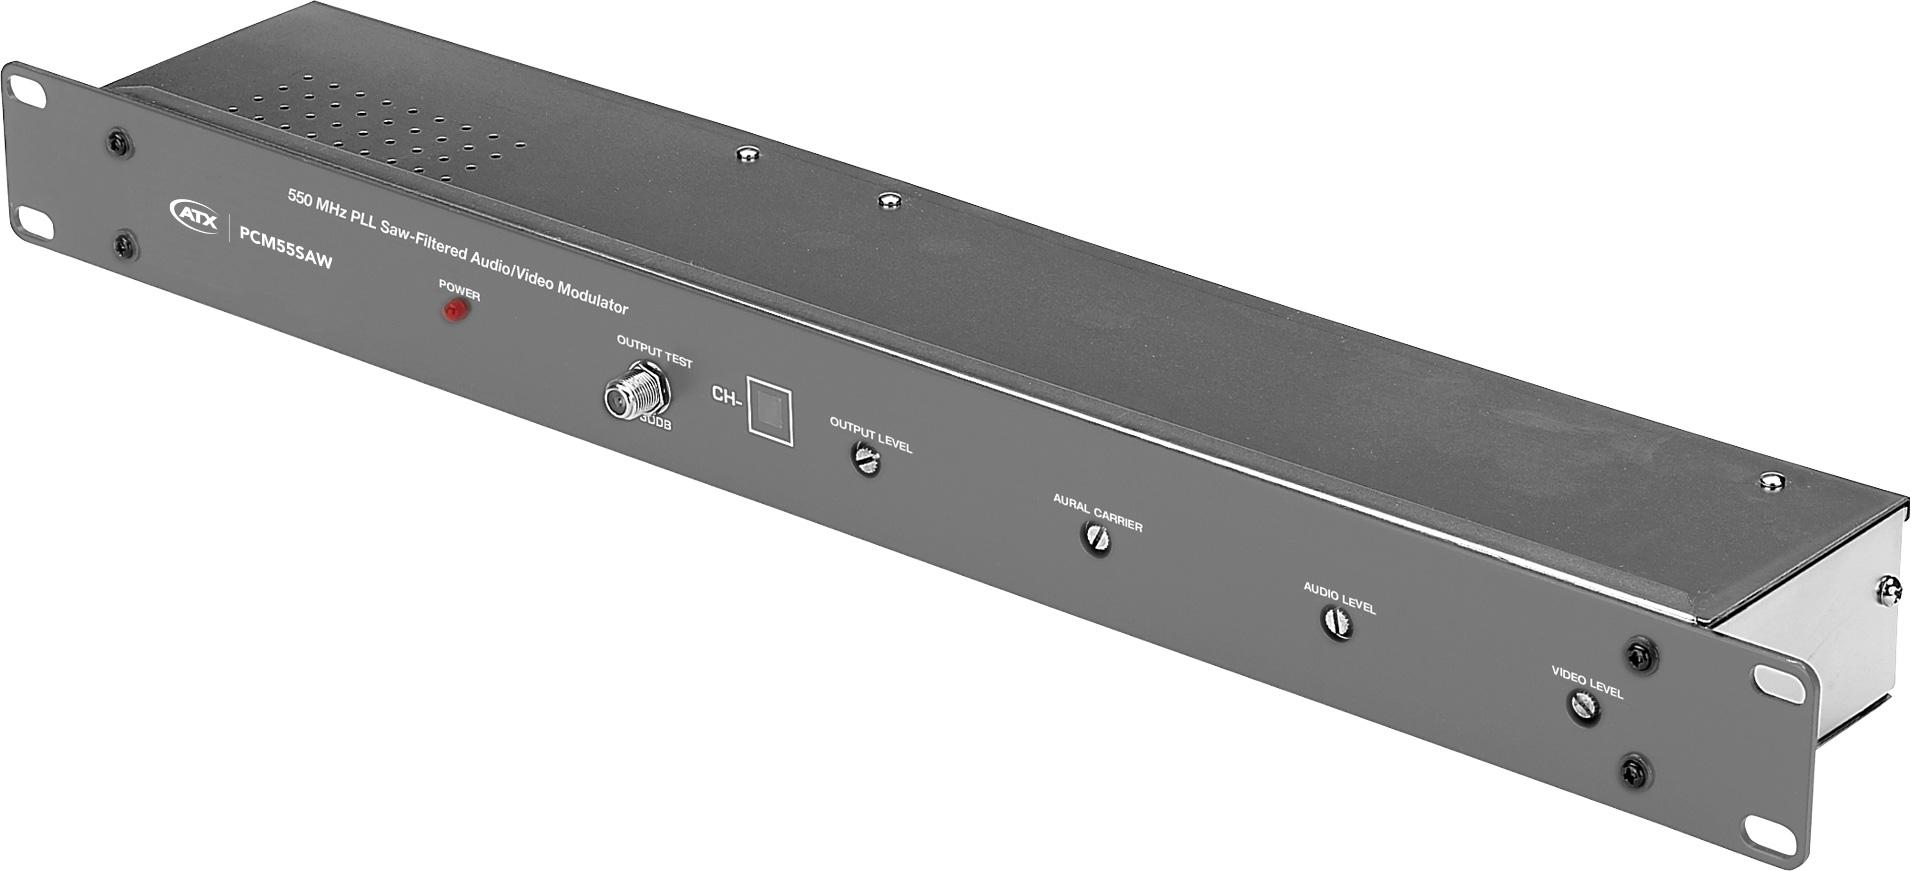 1 Channel Crystal A/V Modulator - Channel 7 PM-PCM55SAW-7